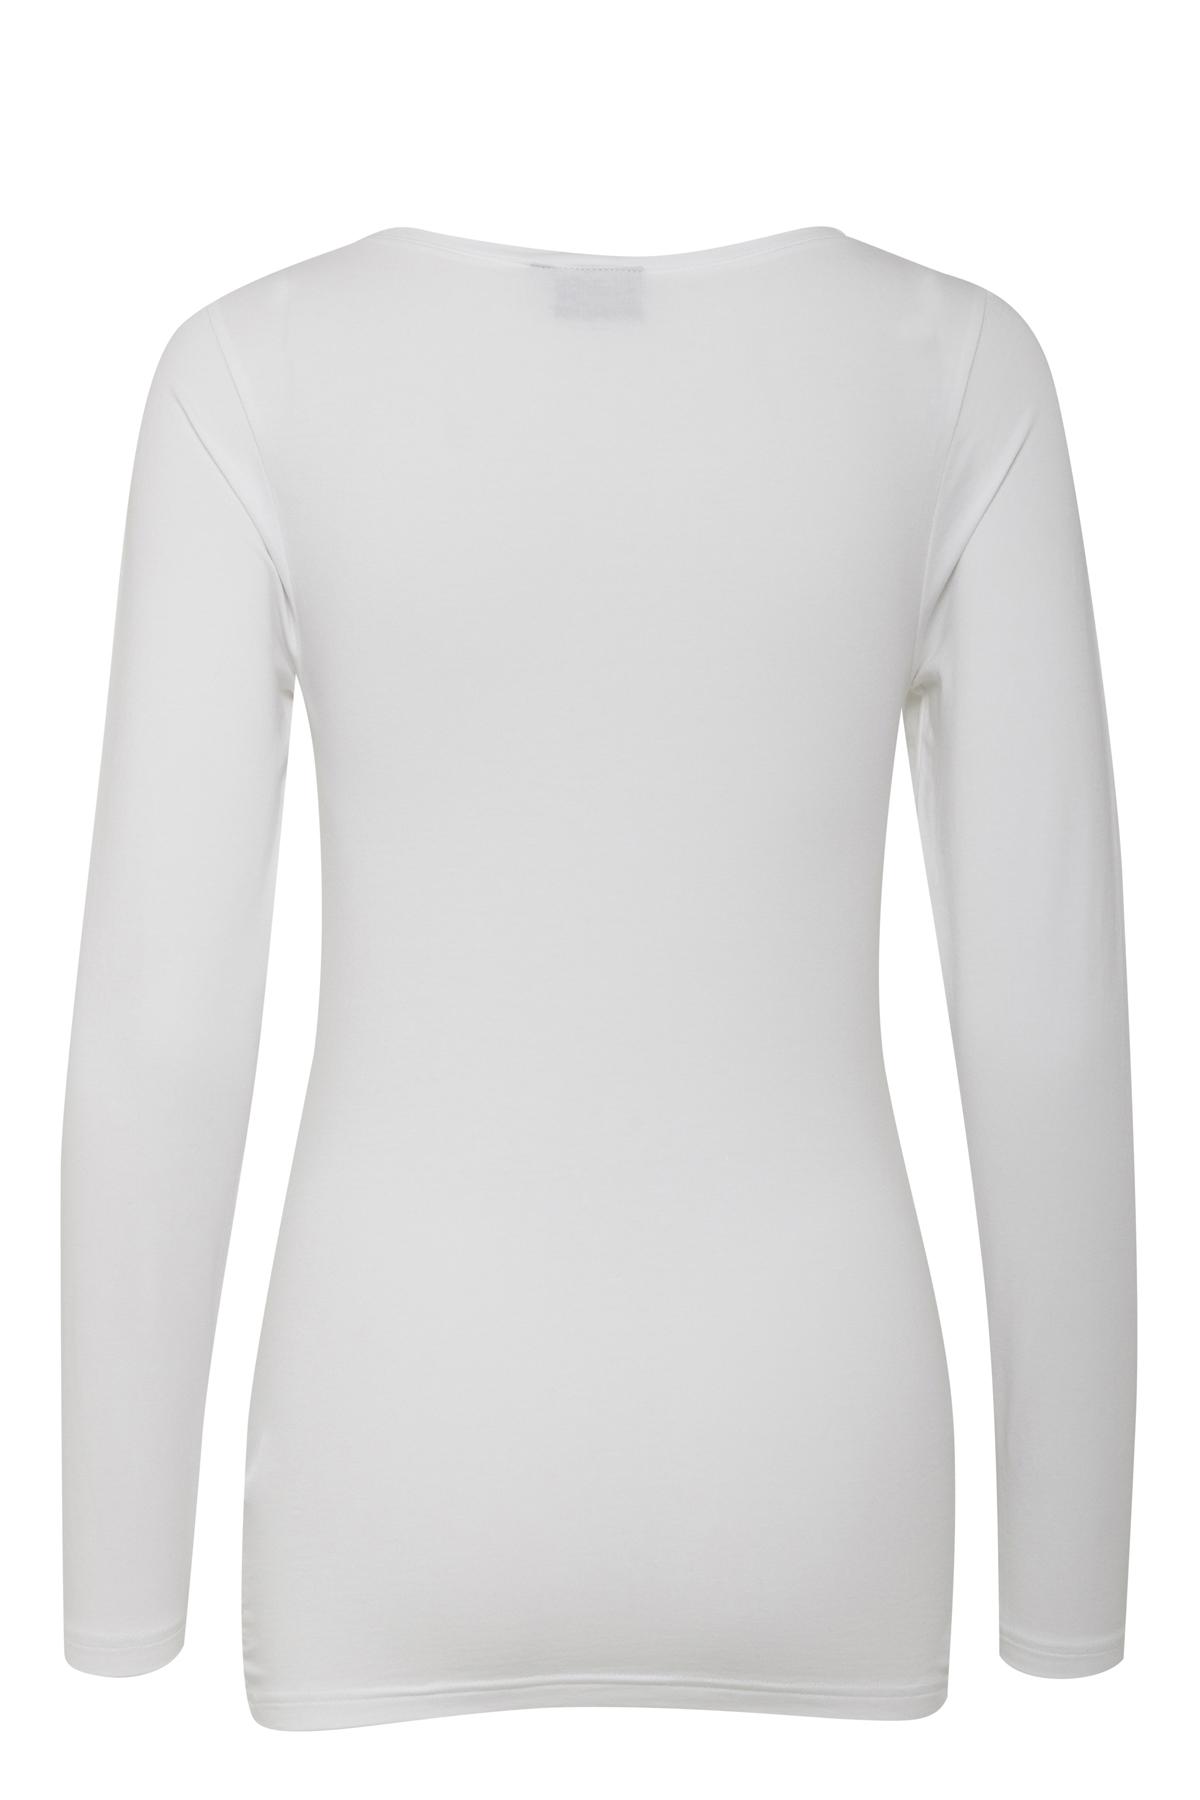 Optical White Langærmet T-shirt fra b.young – Køb Optical White Langærmet T-shirt fra str. XS-XXL her